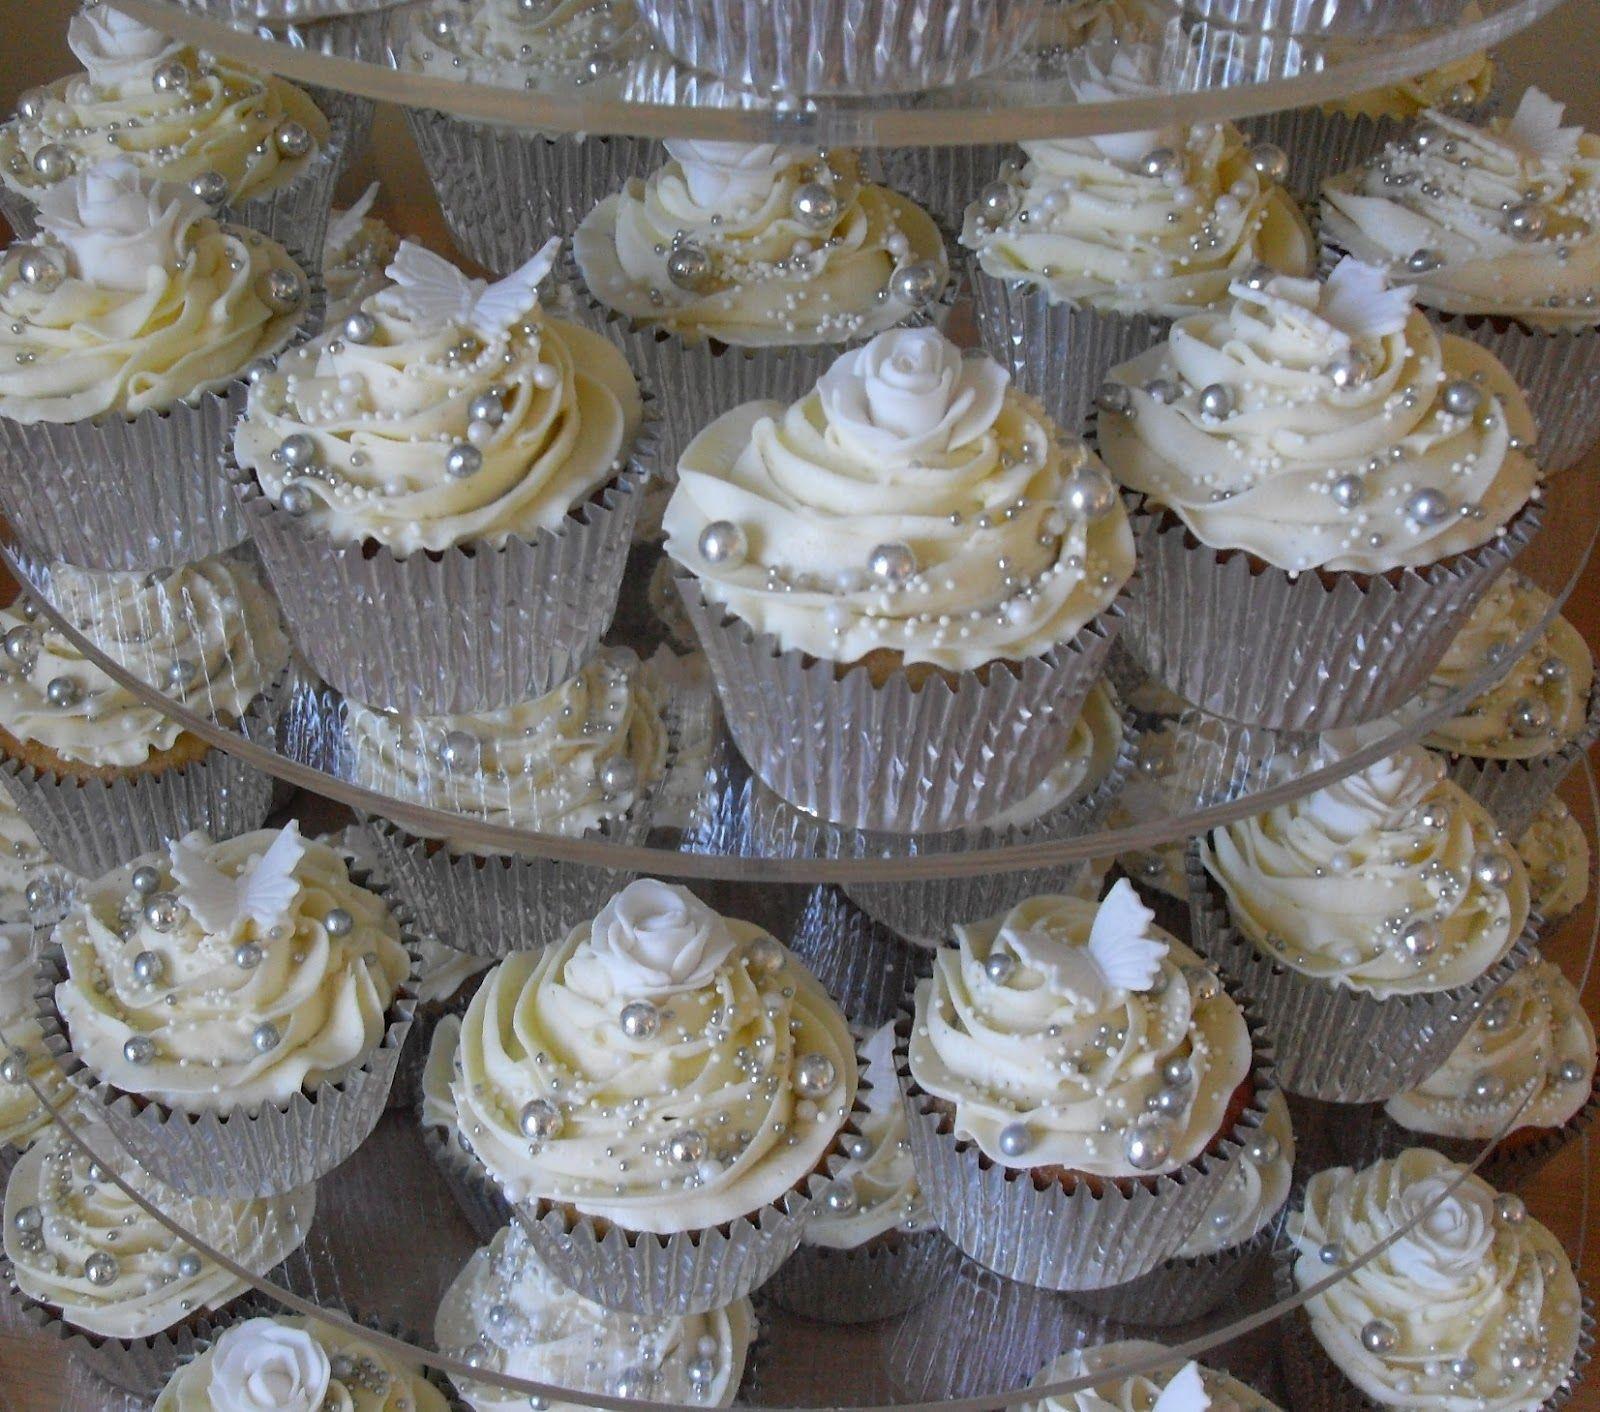 Wedding Cupcake Decorating Ideas: 25th Wedding Anniversary Cupcakes Tower